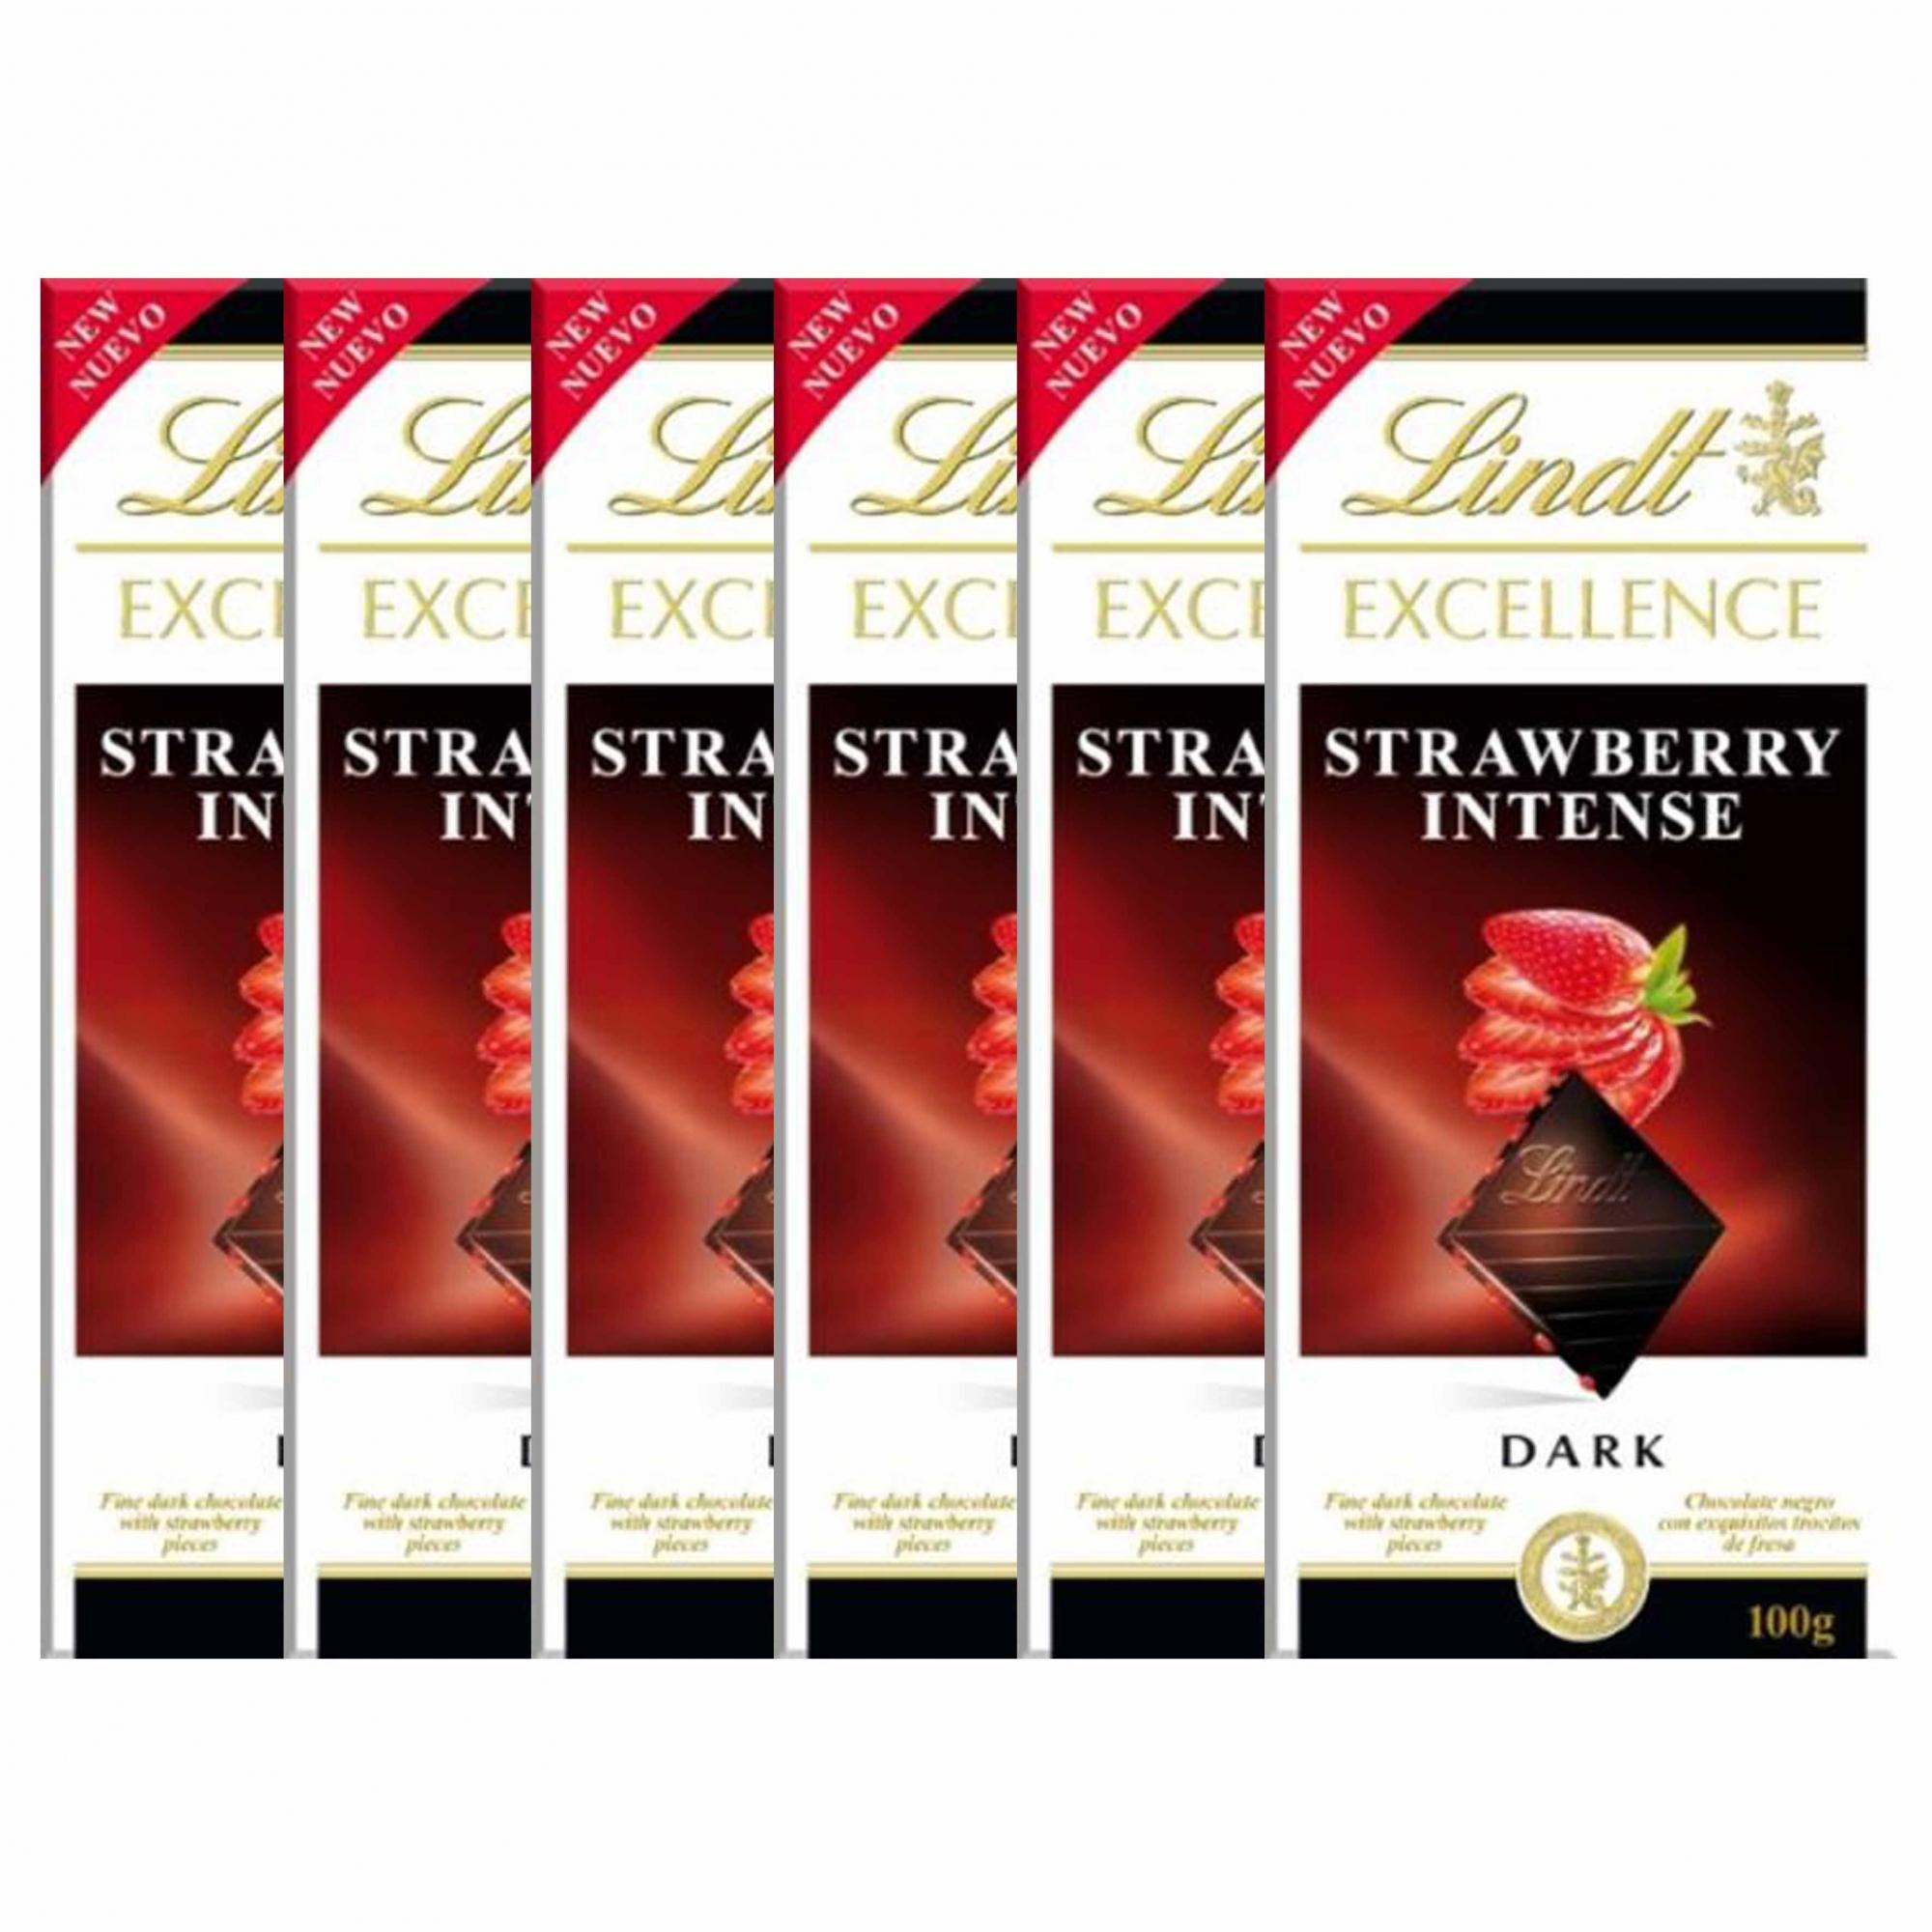 Kit 6x Barra de Chocolate Lindt Excellence Strawberry Intense 100g Dark